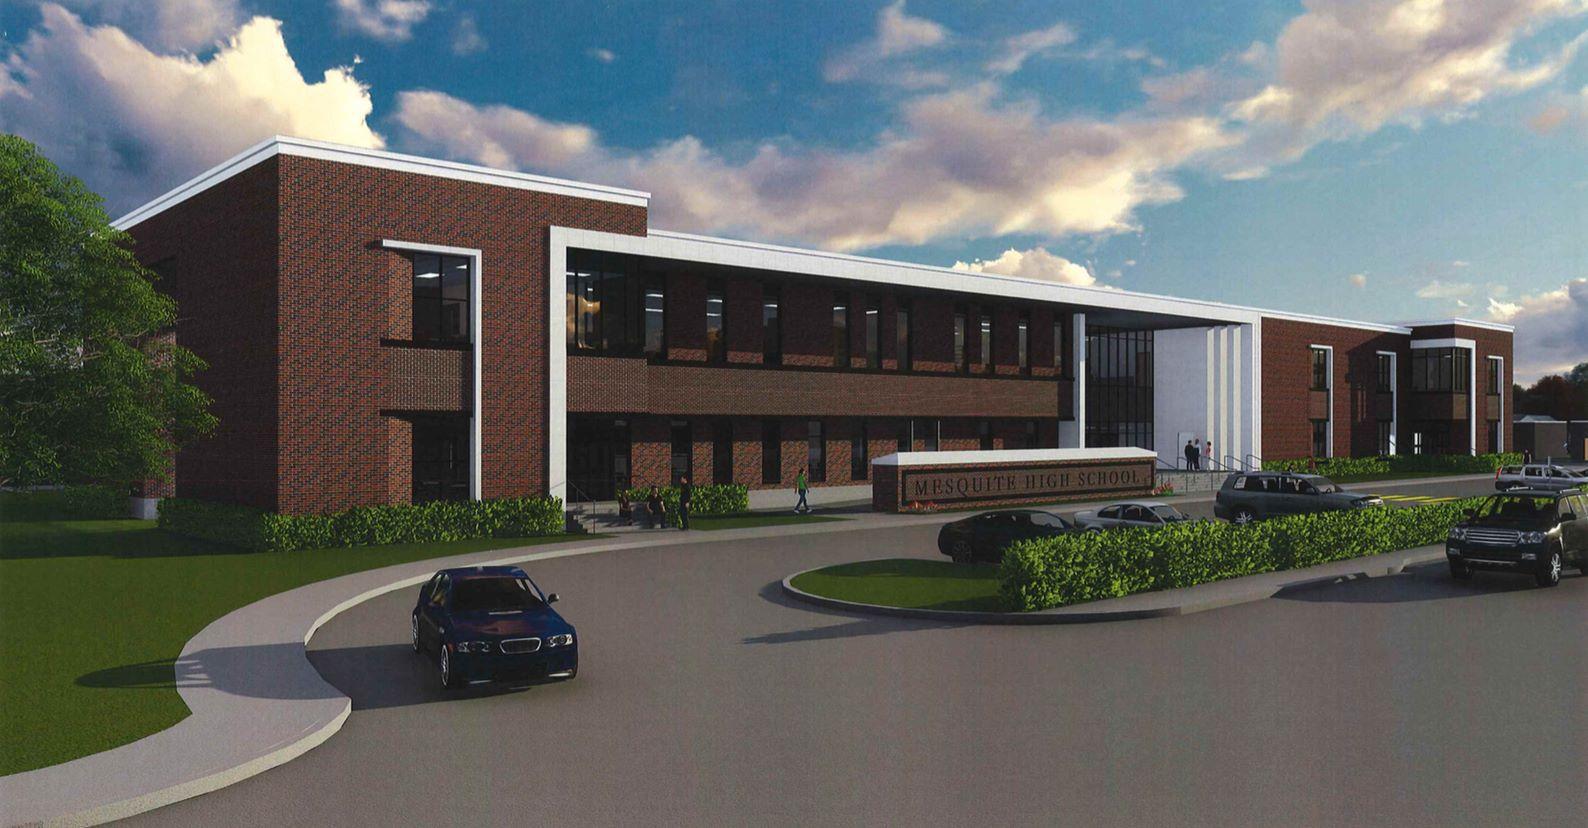 Mesquite High School will undergo an $18 million renovation starting in March.